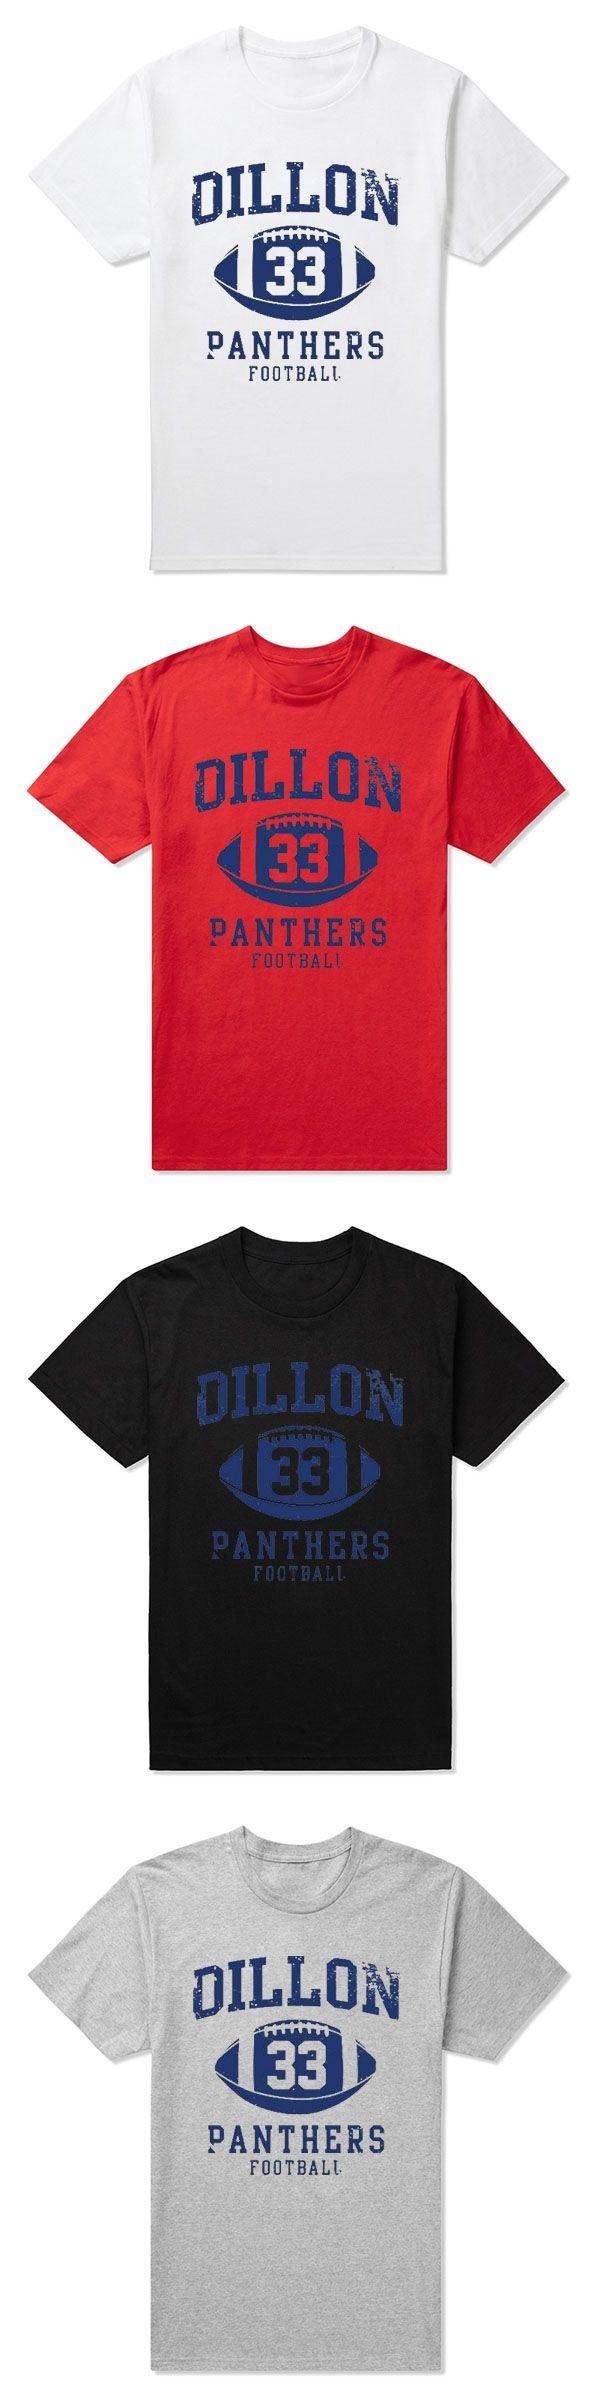 High Quality friday night  Dillon Panthers  tim riggins dillon 33   t-shirt  Camisetas Cloth  panthers